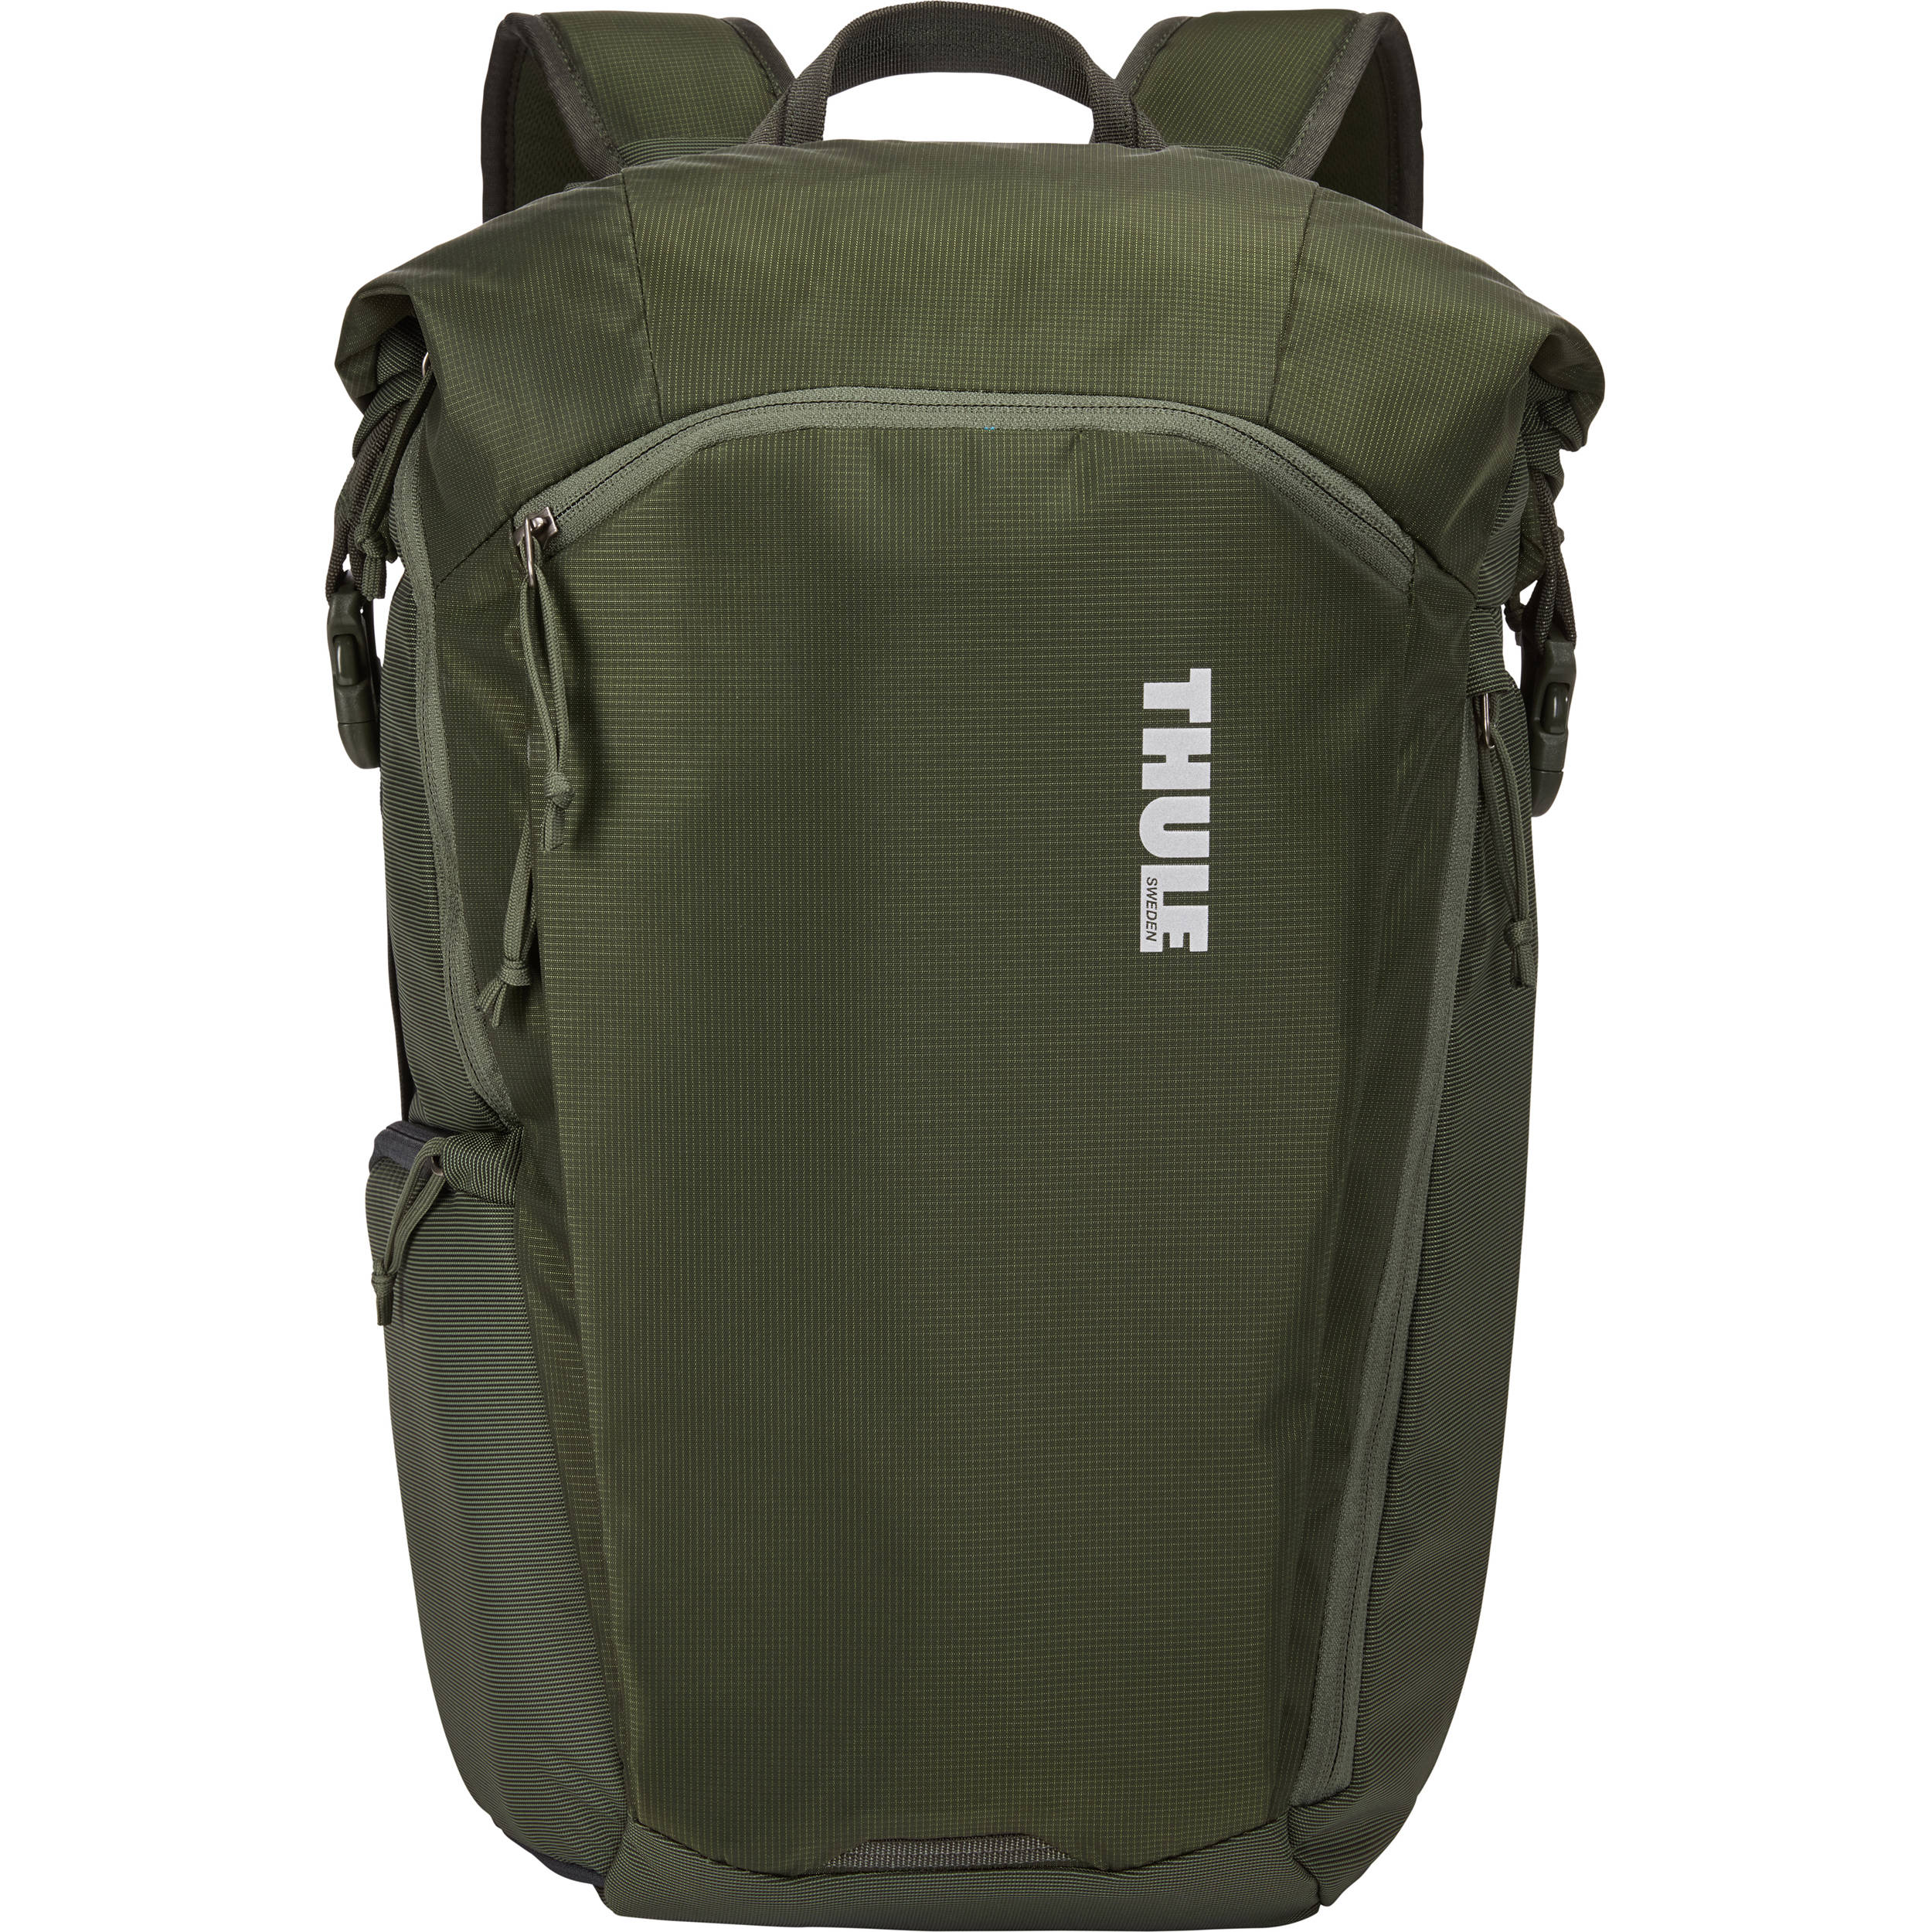 Thule Enroute Camera Backpack 25l Dark Forest 3203905 B Amp H